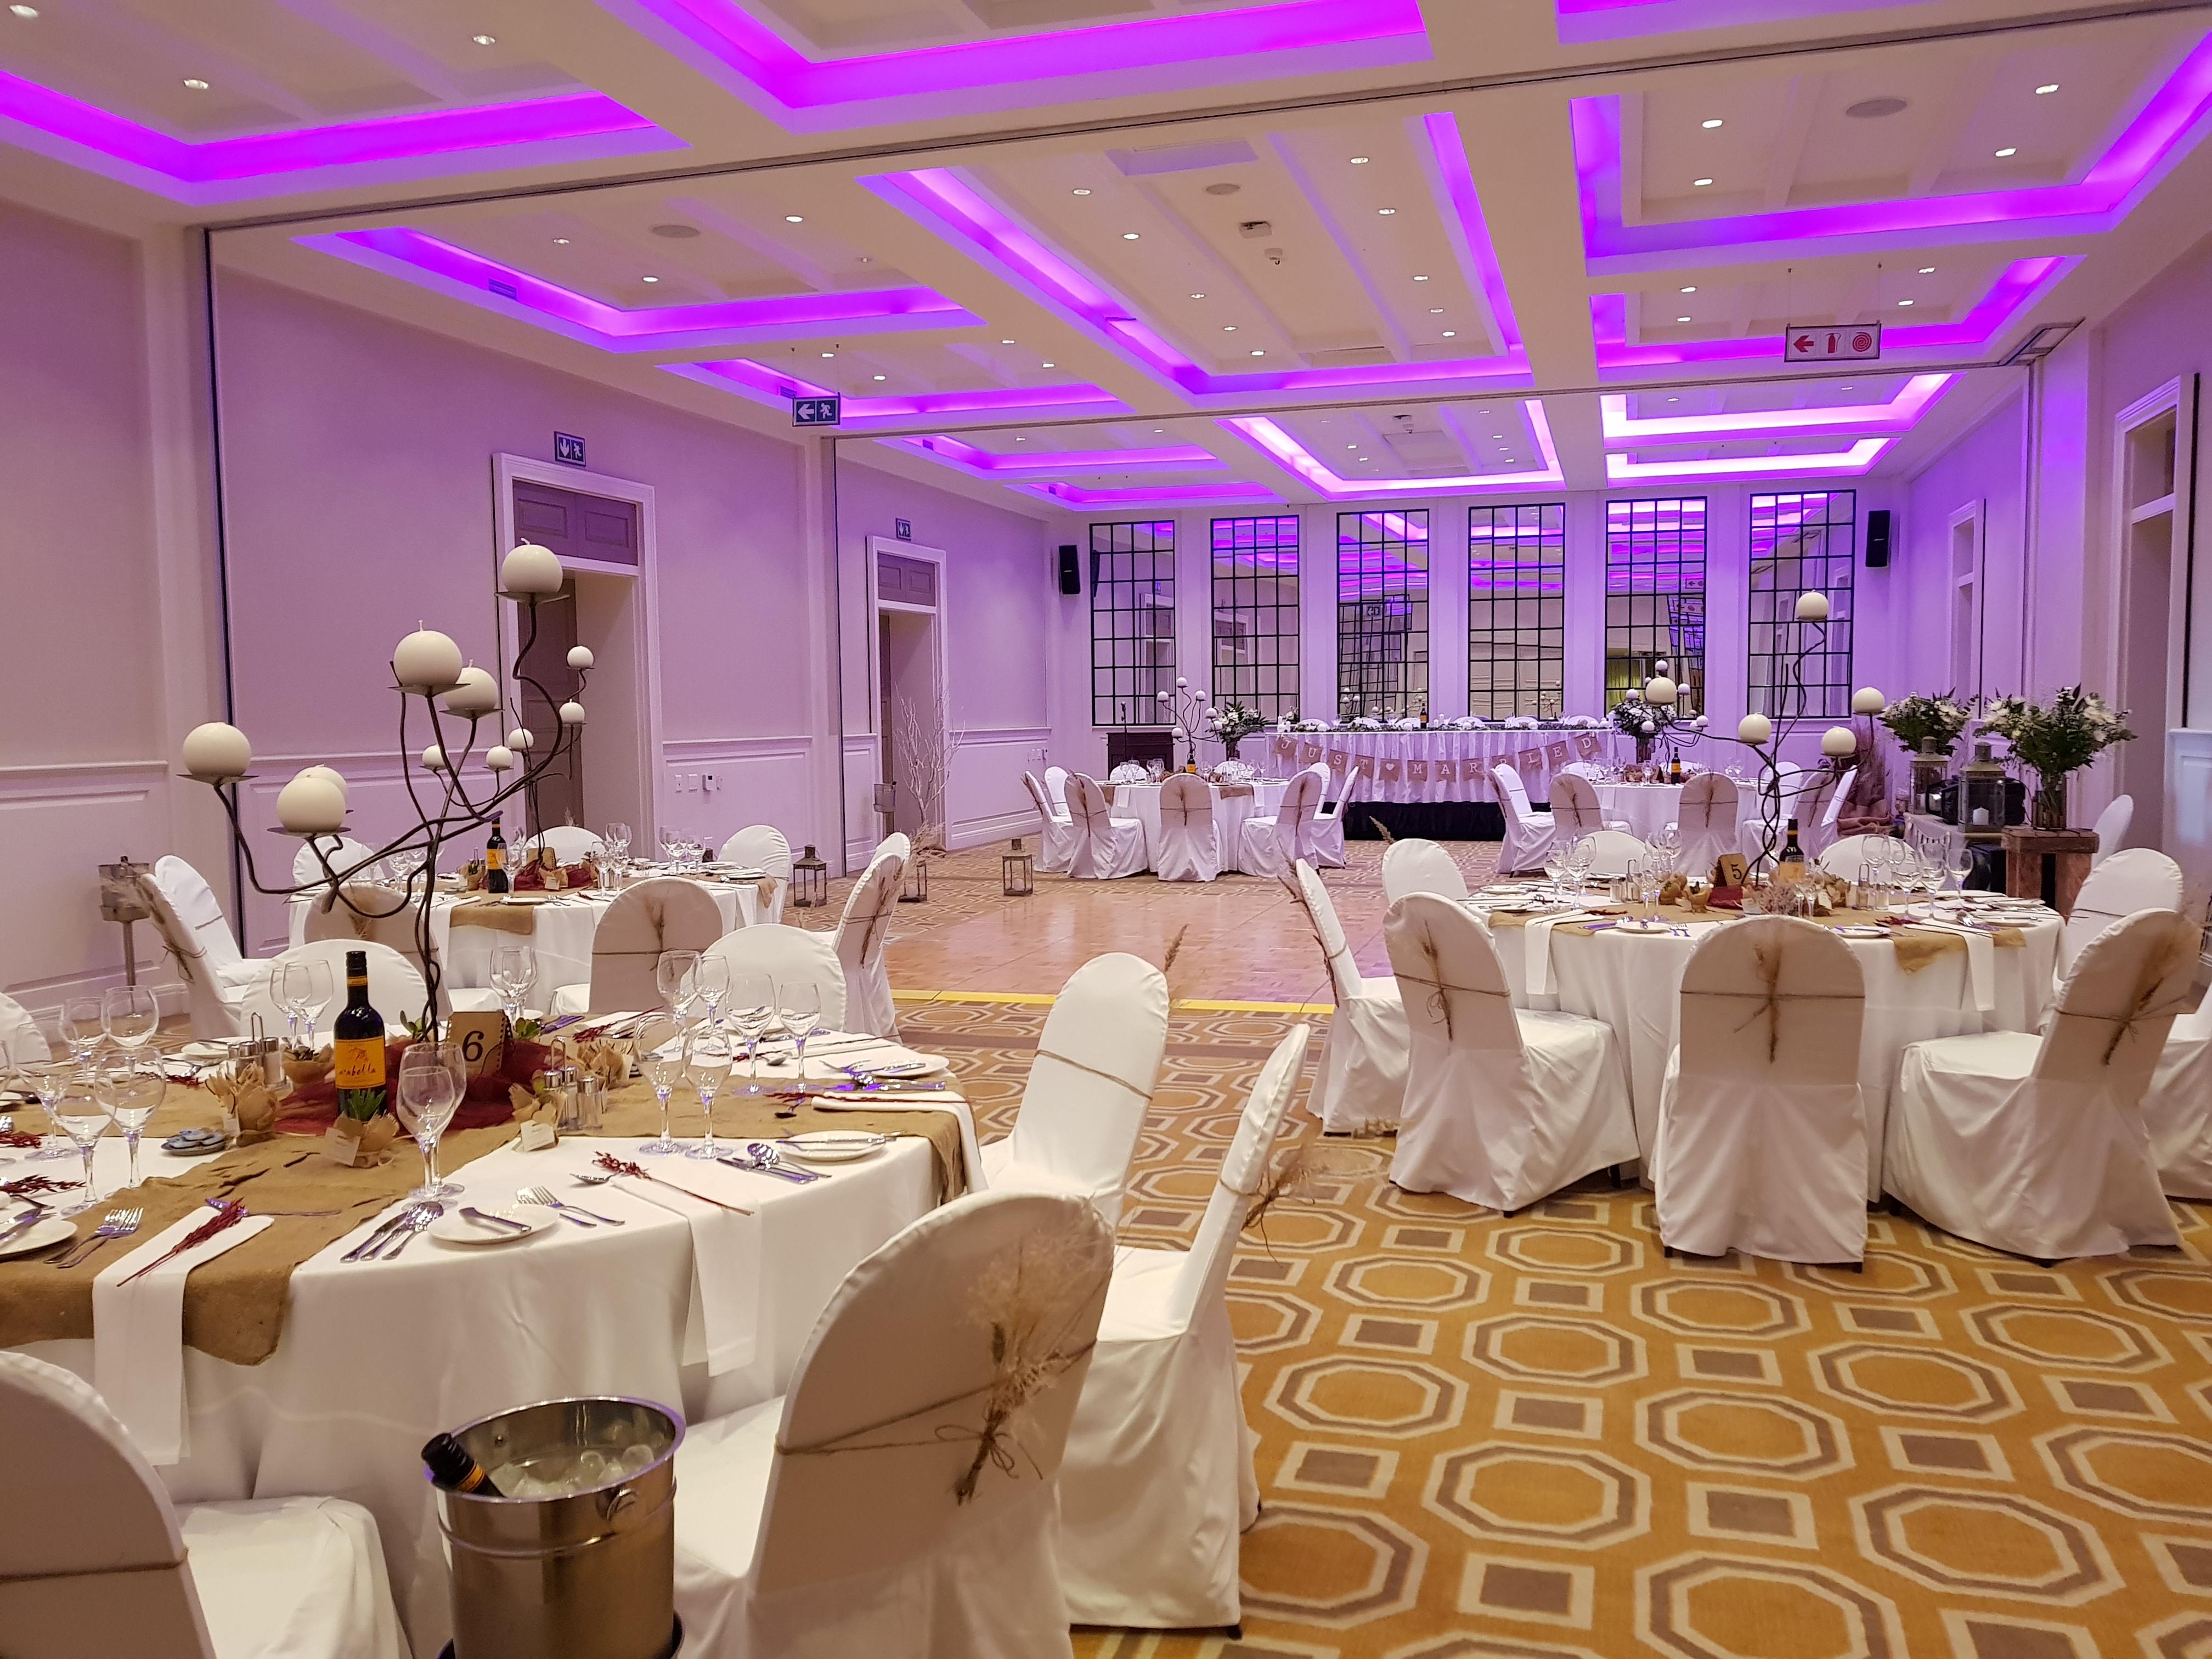 banquet_-_50_guests_-_centre_dancefloor_25c919c1.jpg